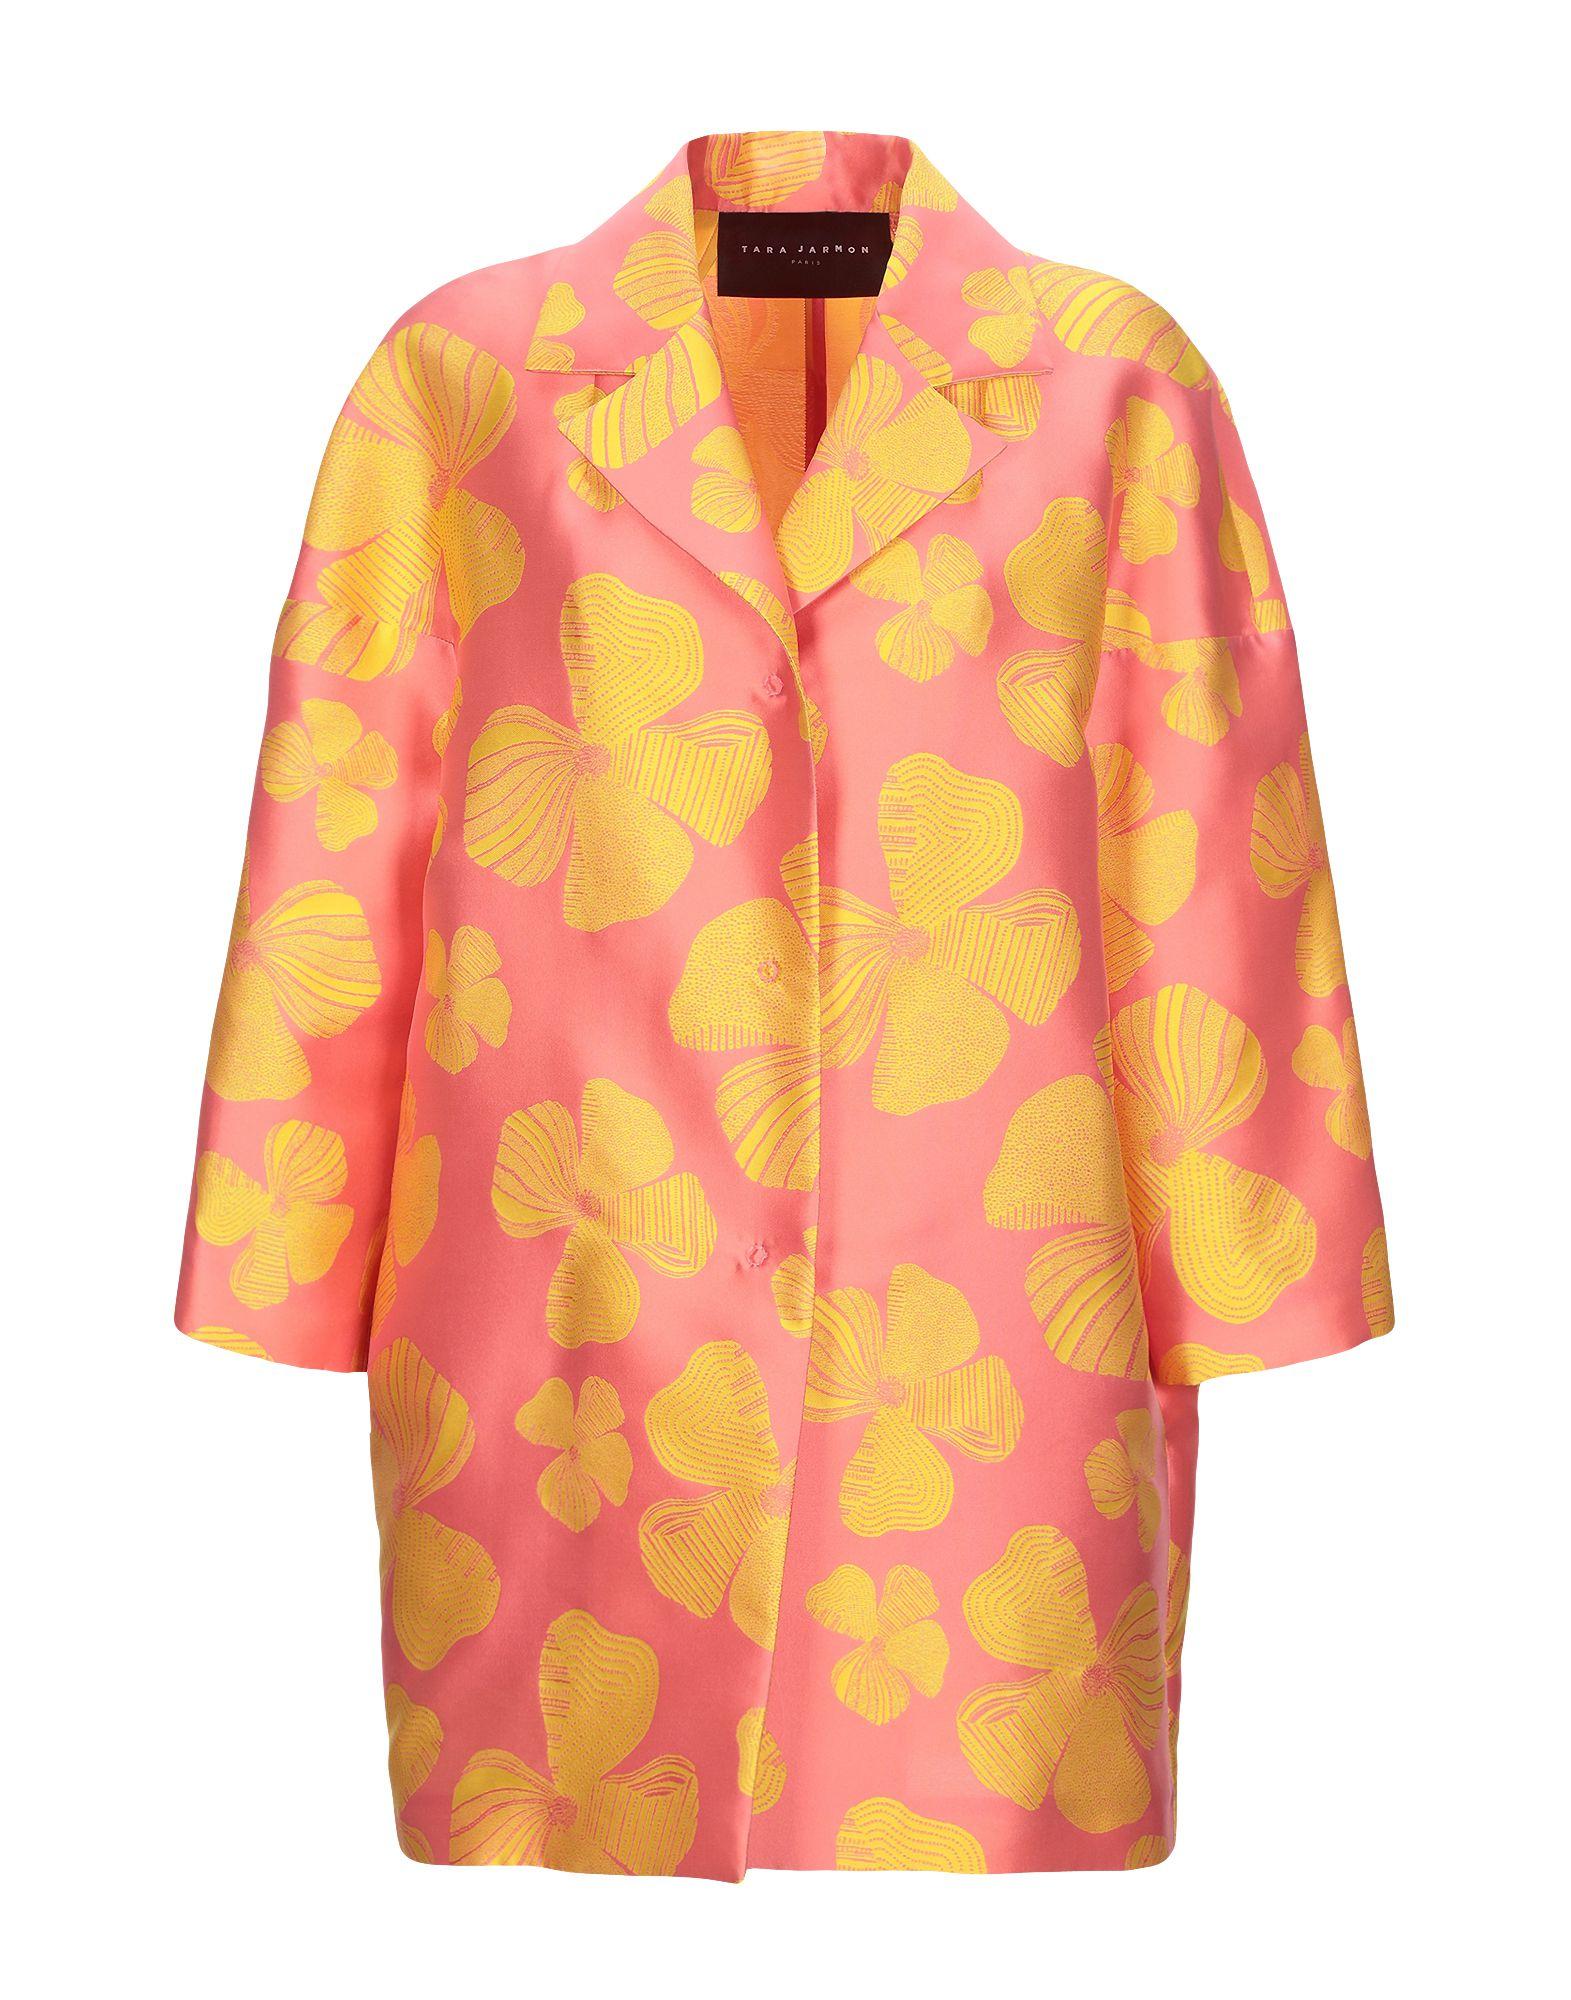 Фото - TARA JARMON Легкое пальто tara jarmon шелковая блузка с принтом